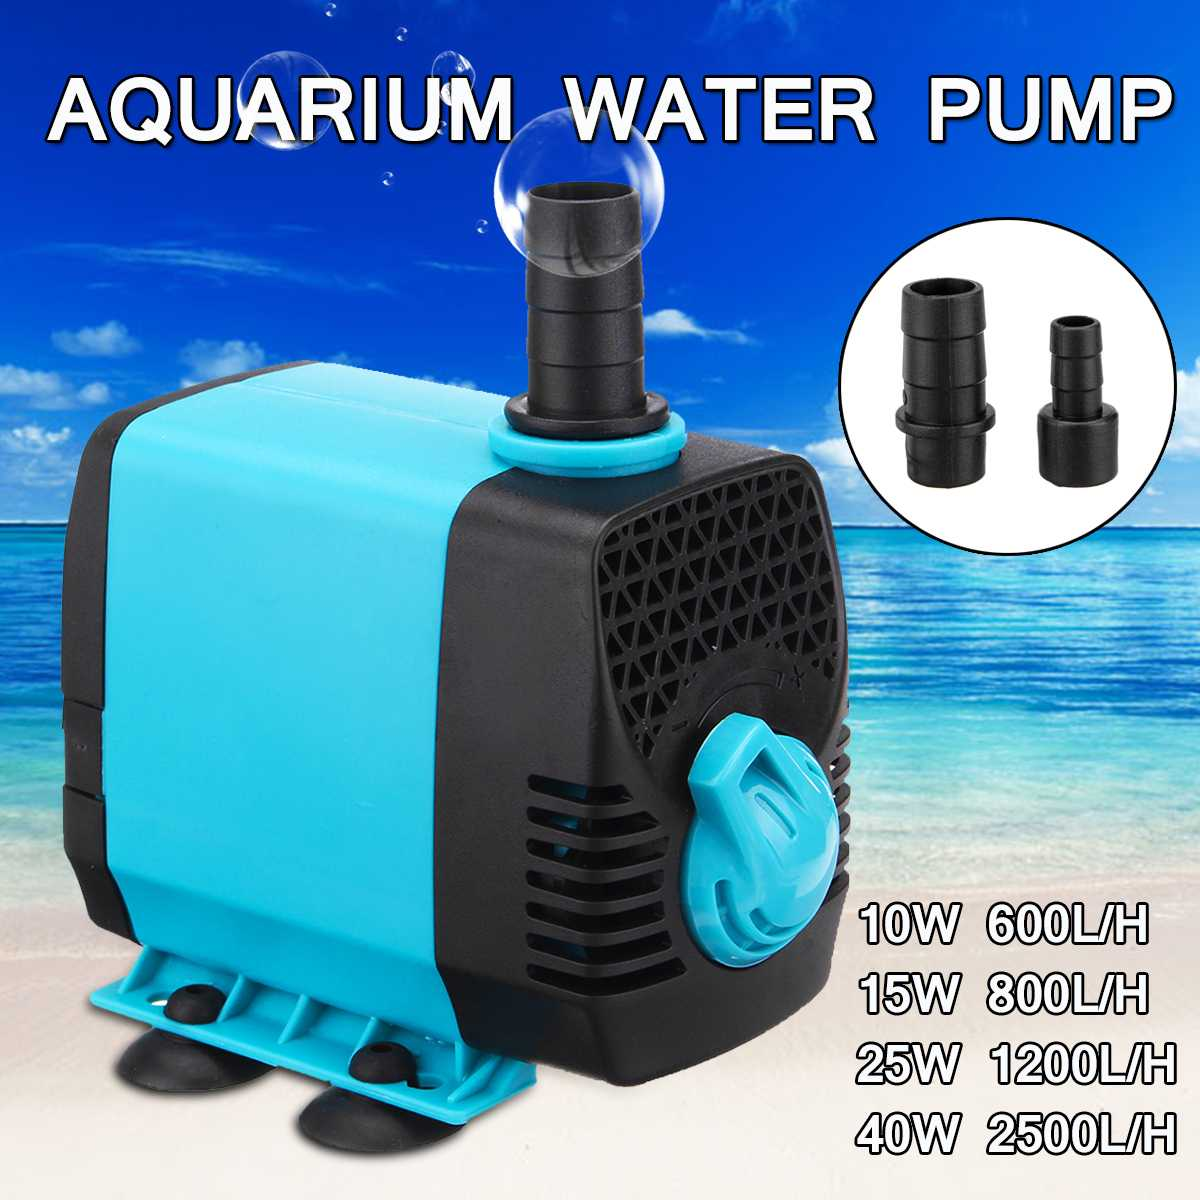 Fish & Aquariums Supply 40w Submersible Water Pump Aquarium Fish Tank Fountain Hydroponic Multifunction